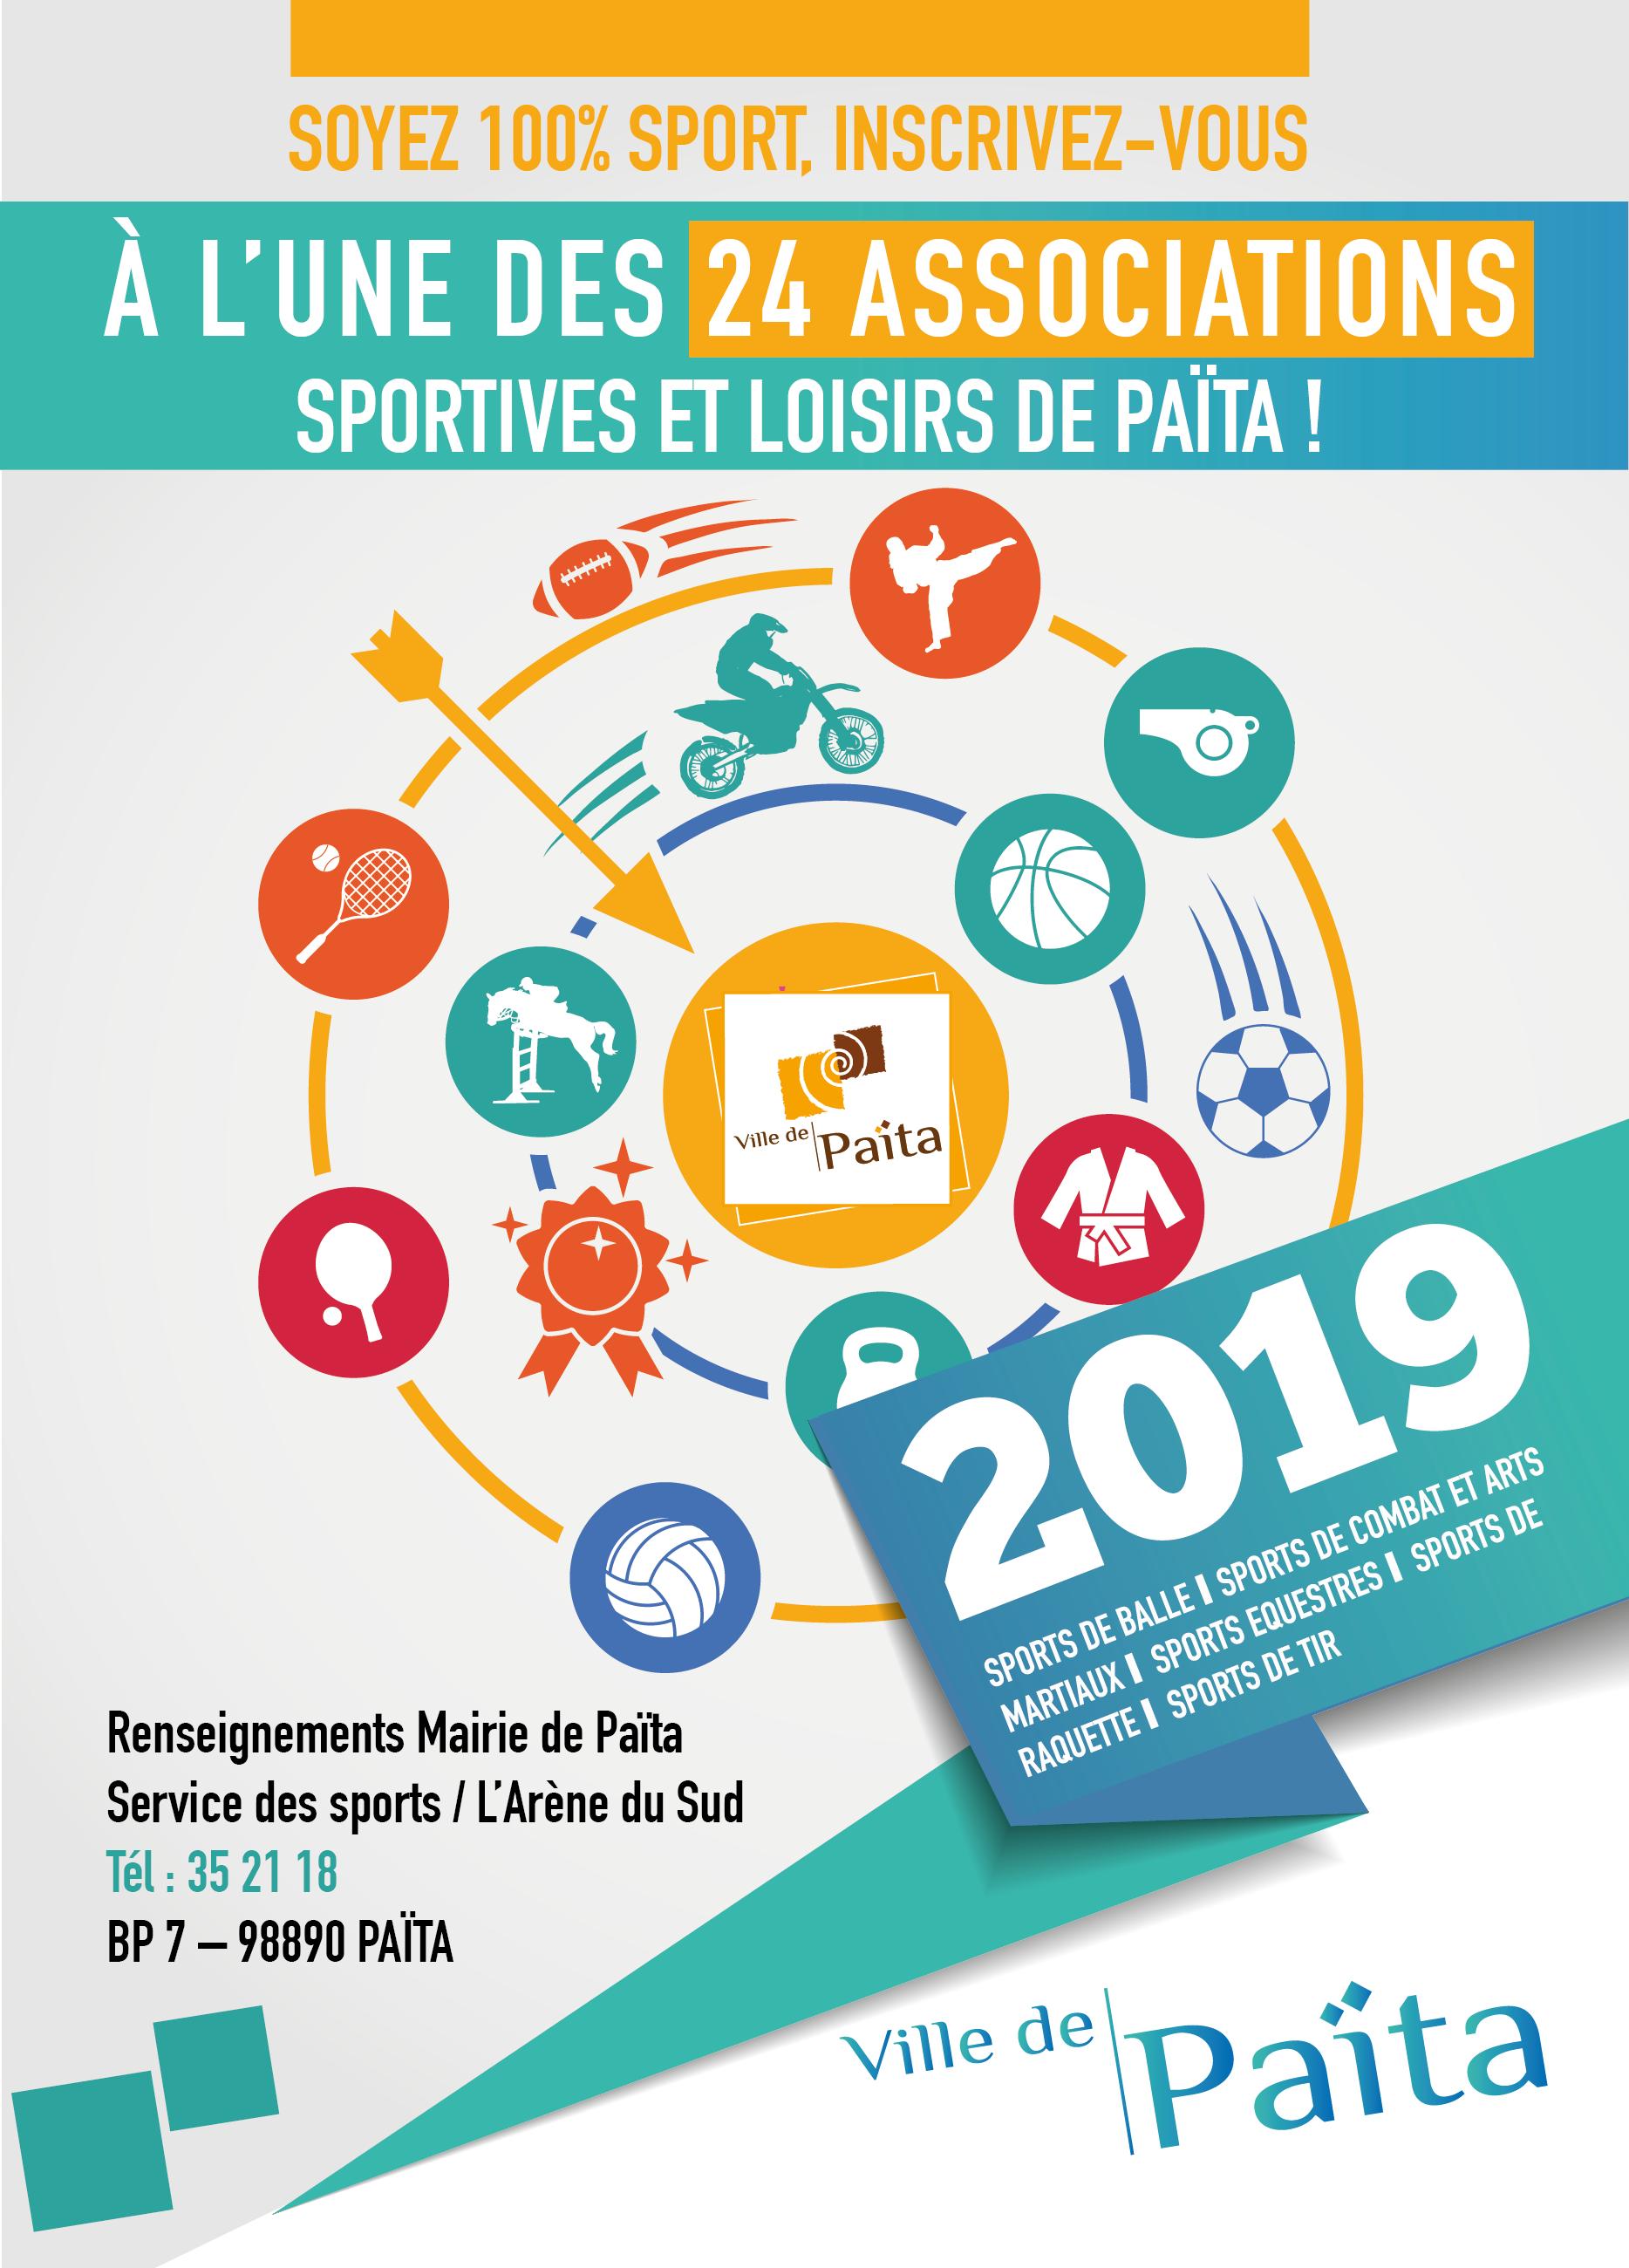 Les associations sportives et loisirs Païta